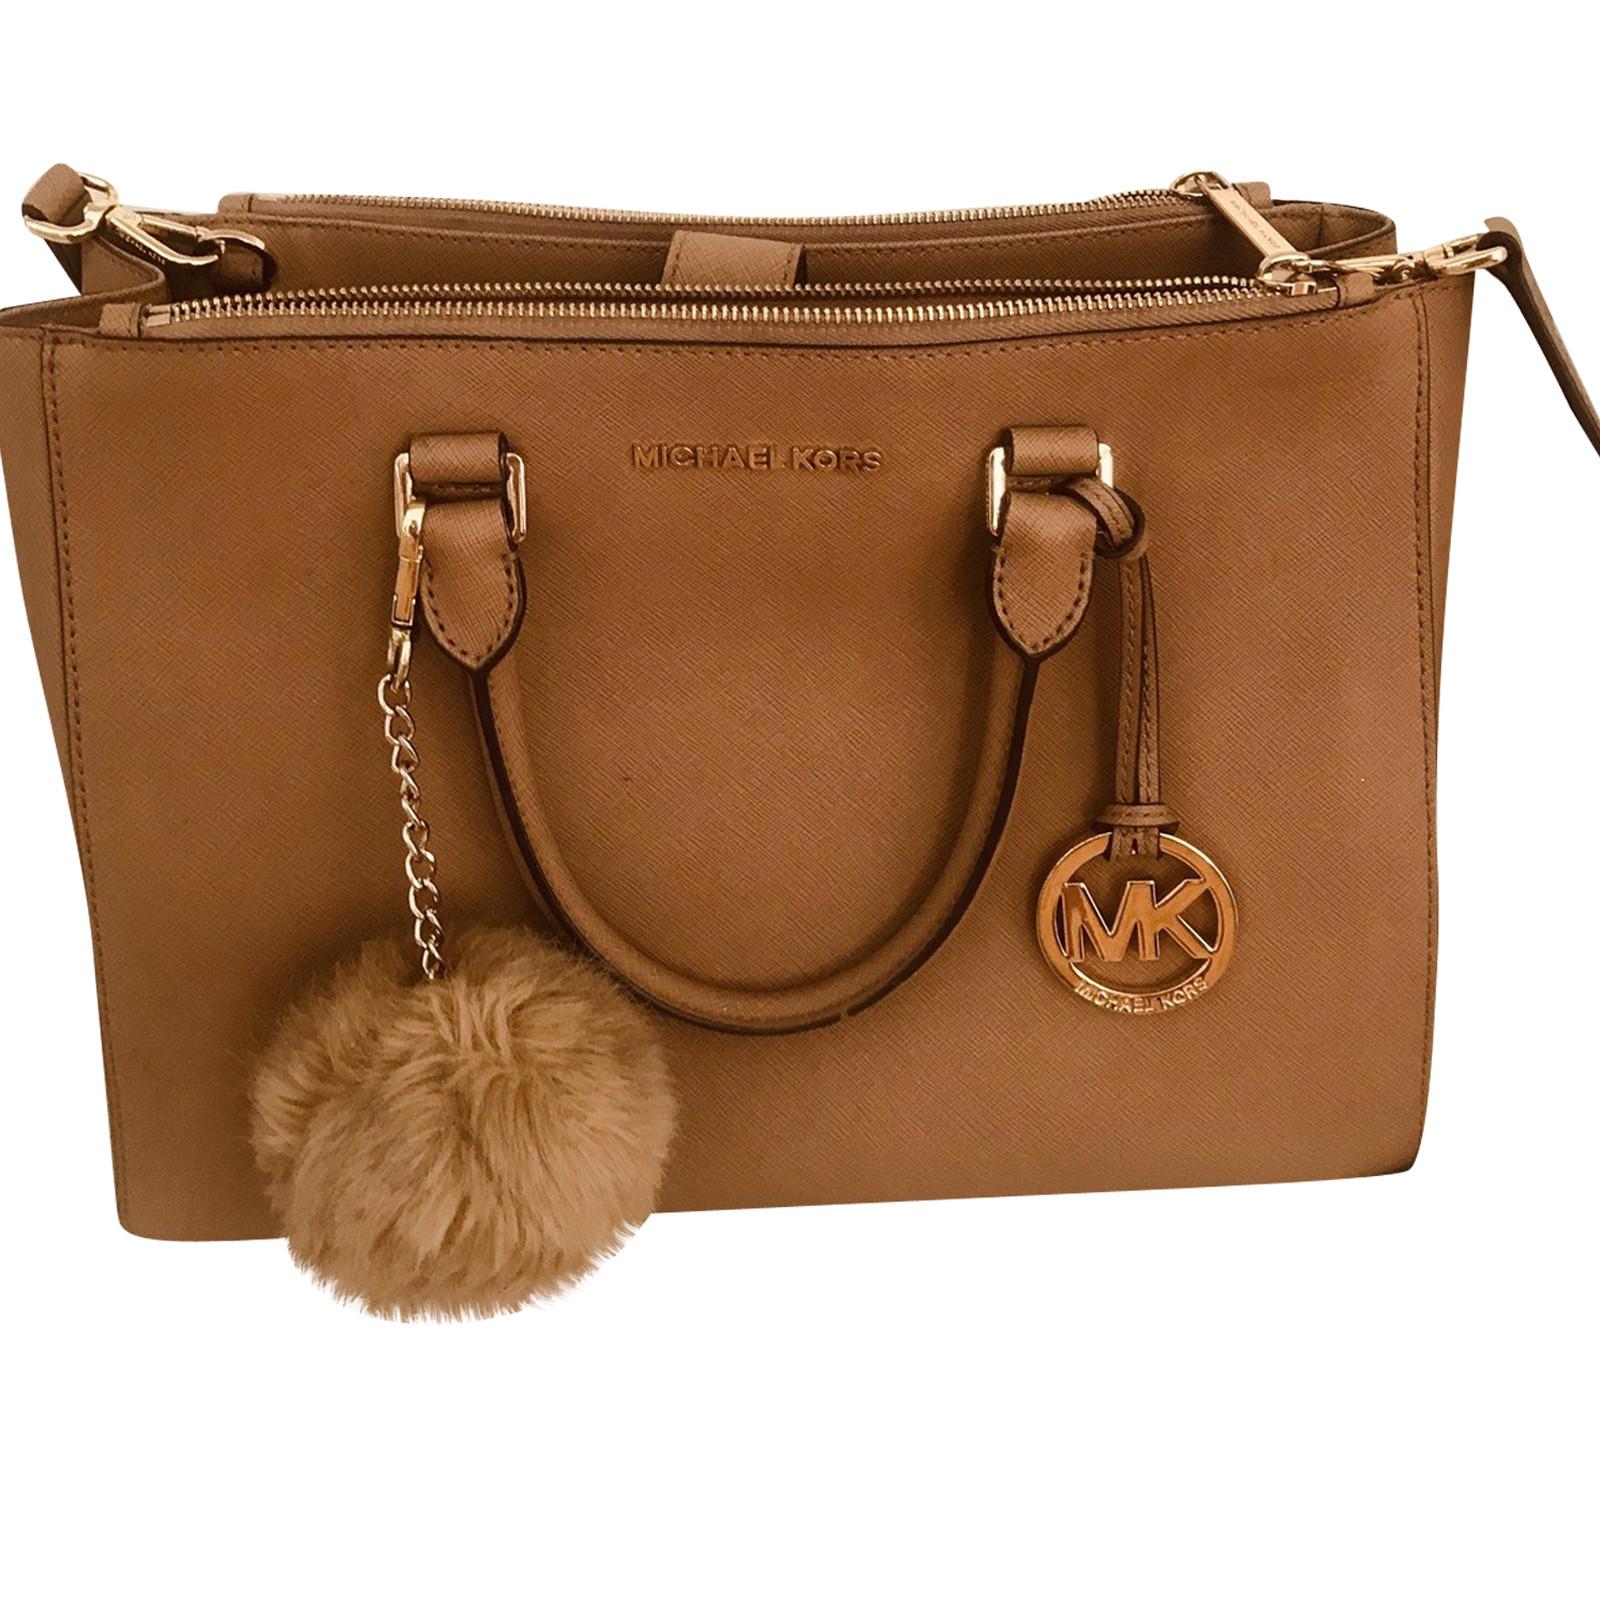 Michael Kors Handbag Leather in Brown Second Hand Michael